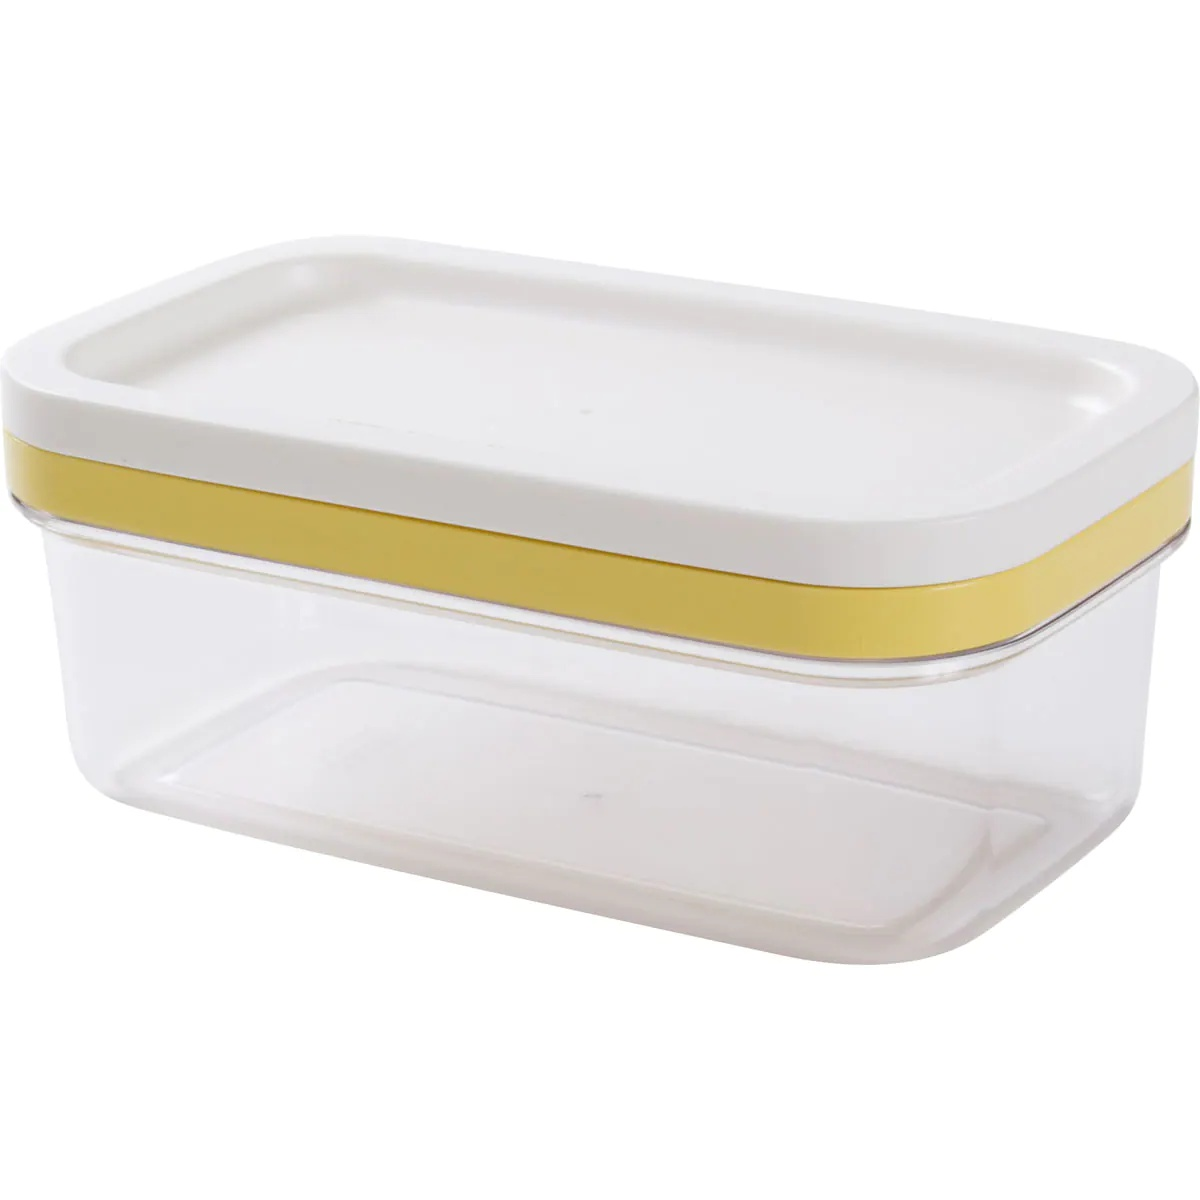 NITORI(ニトリ) バターケースの商品画像8